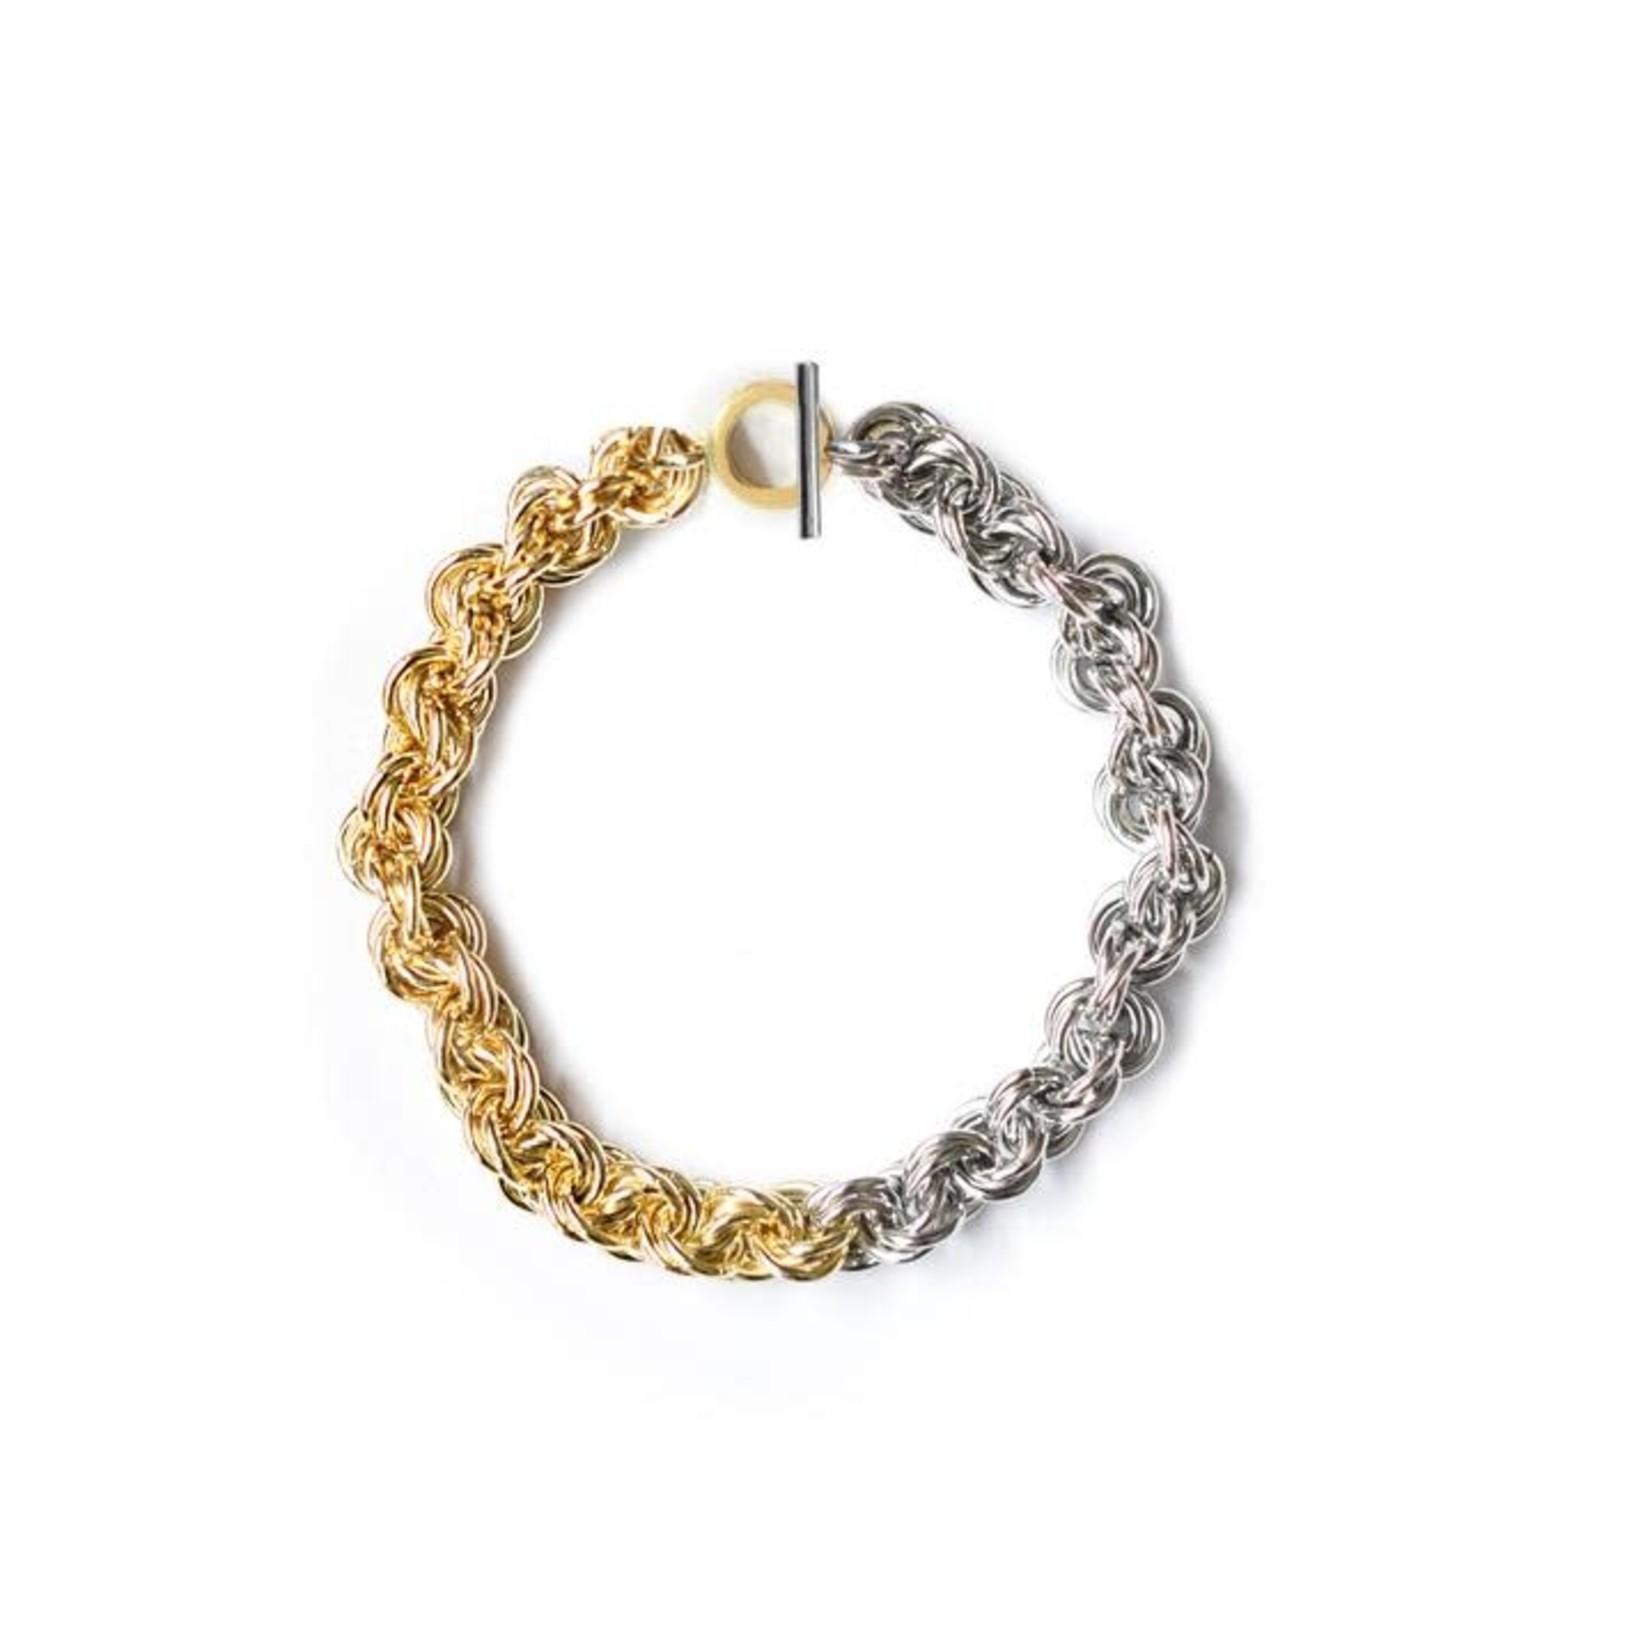 Adriana Pappas Mixed Metal Bracelet